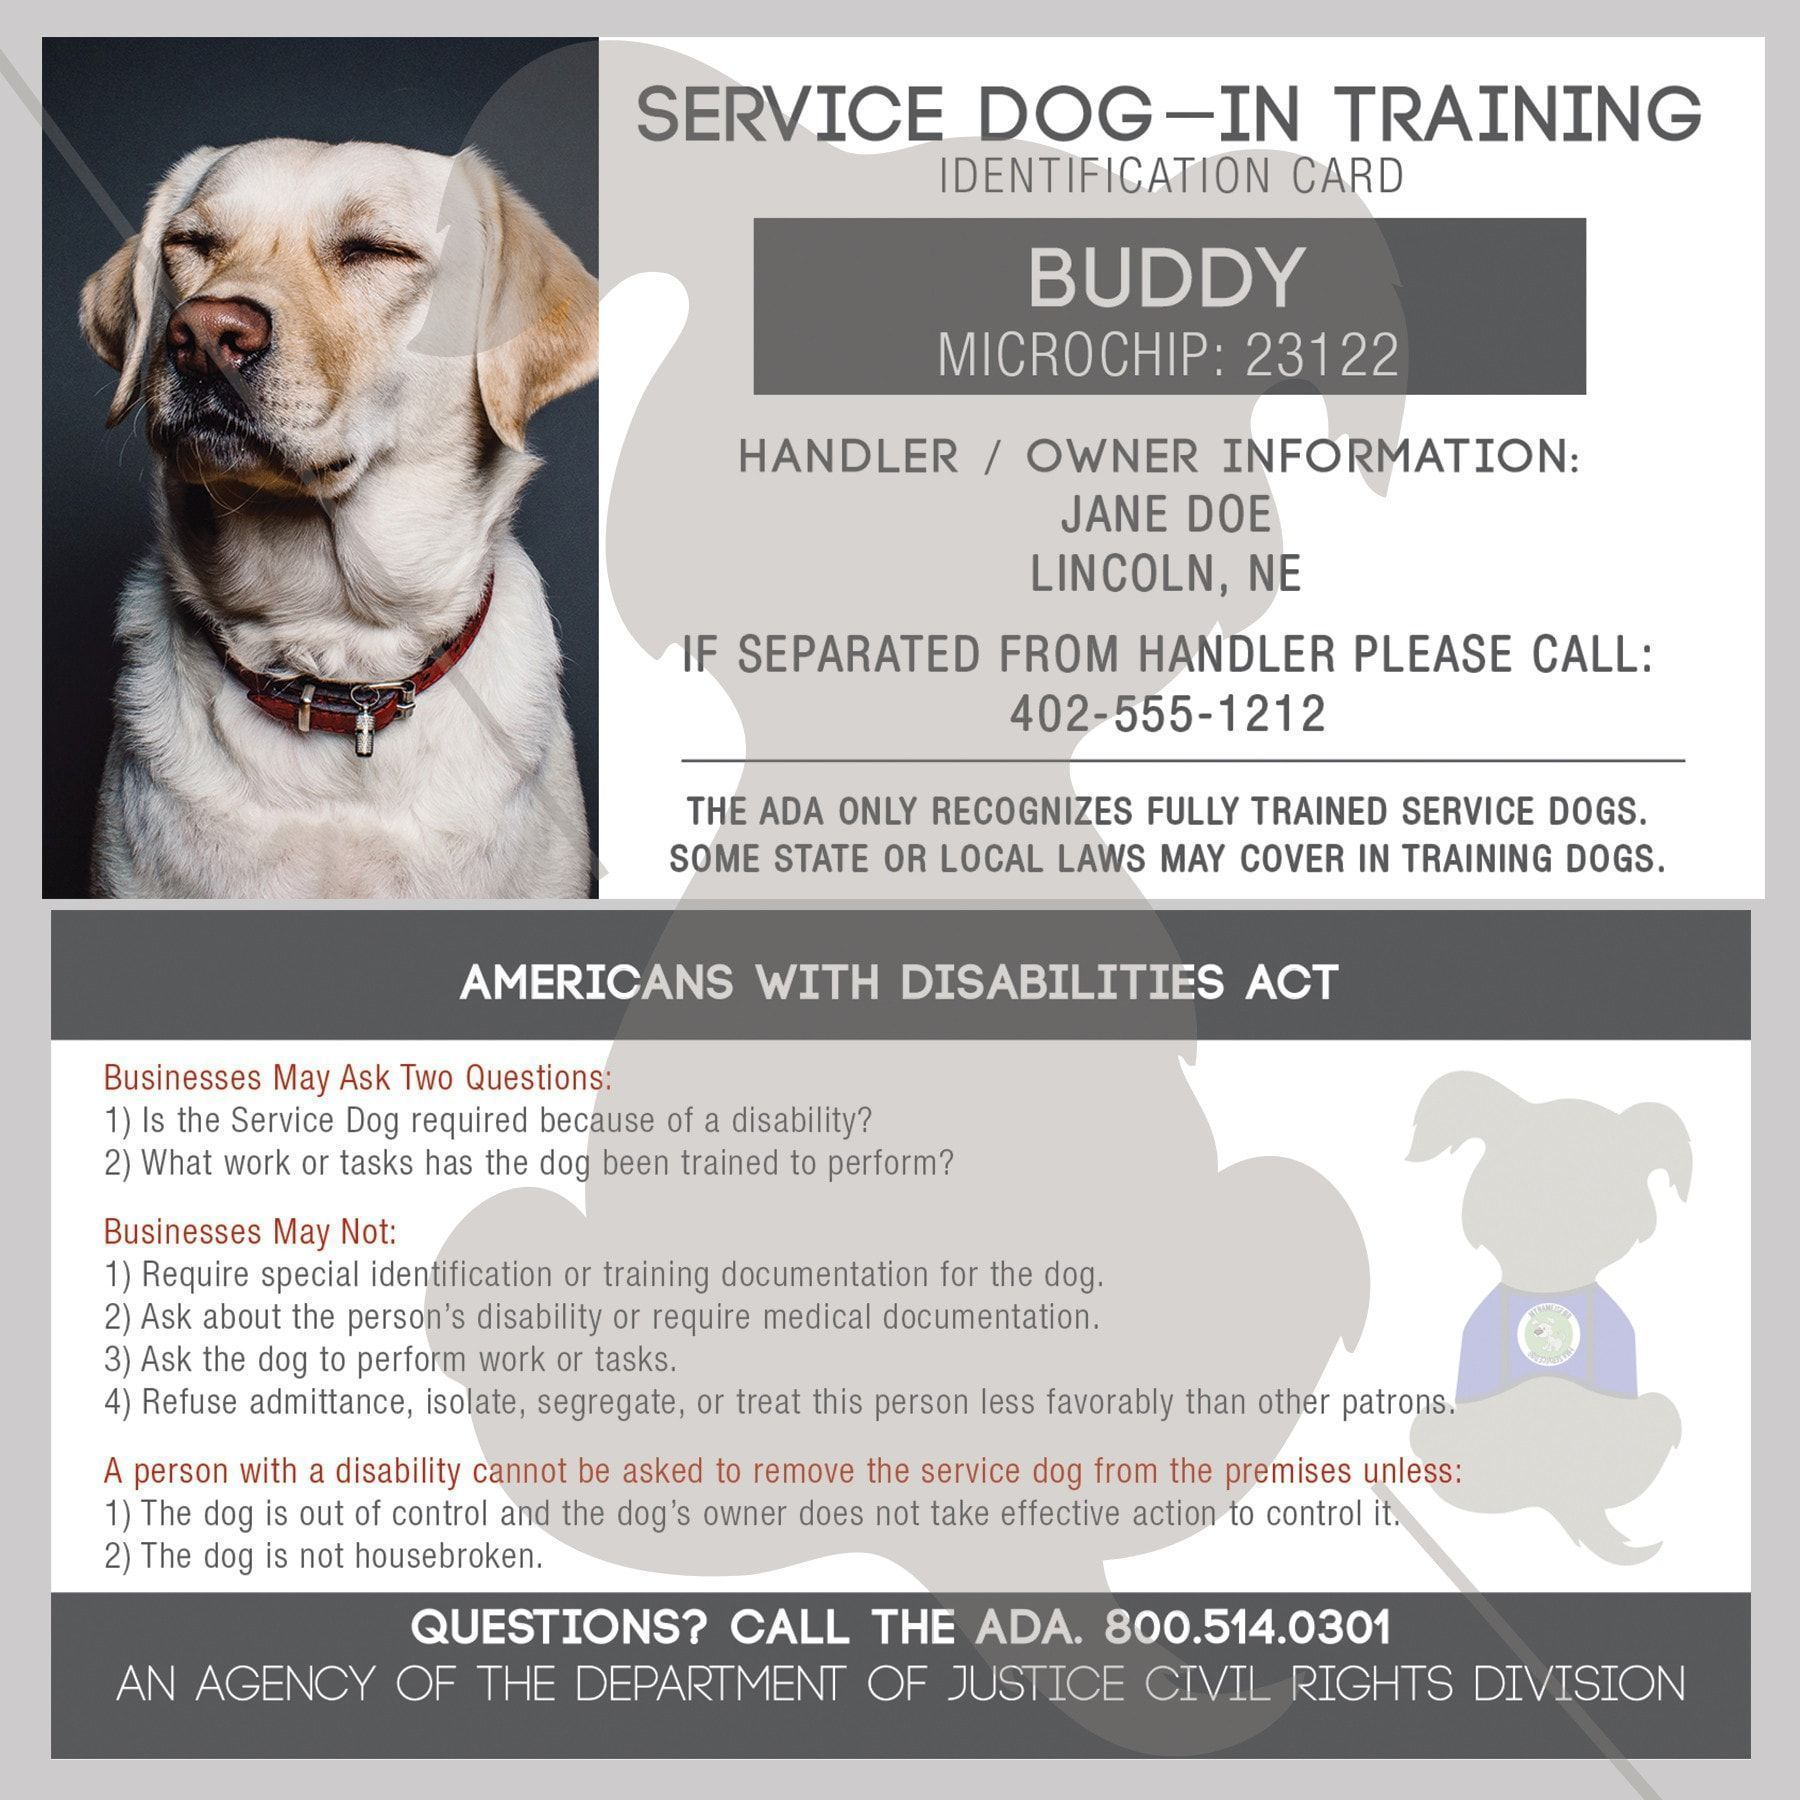 Id Card Service Dog In Training Doganxietydiy Service Dogs Dog Training Dog Identification